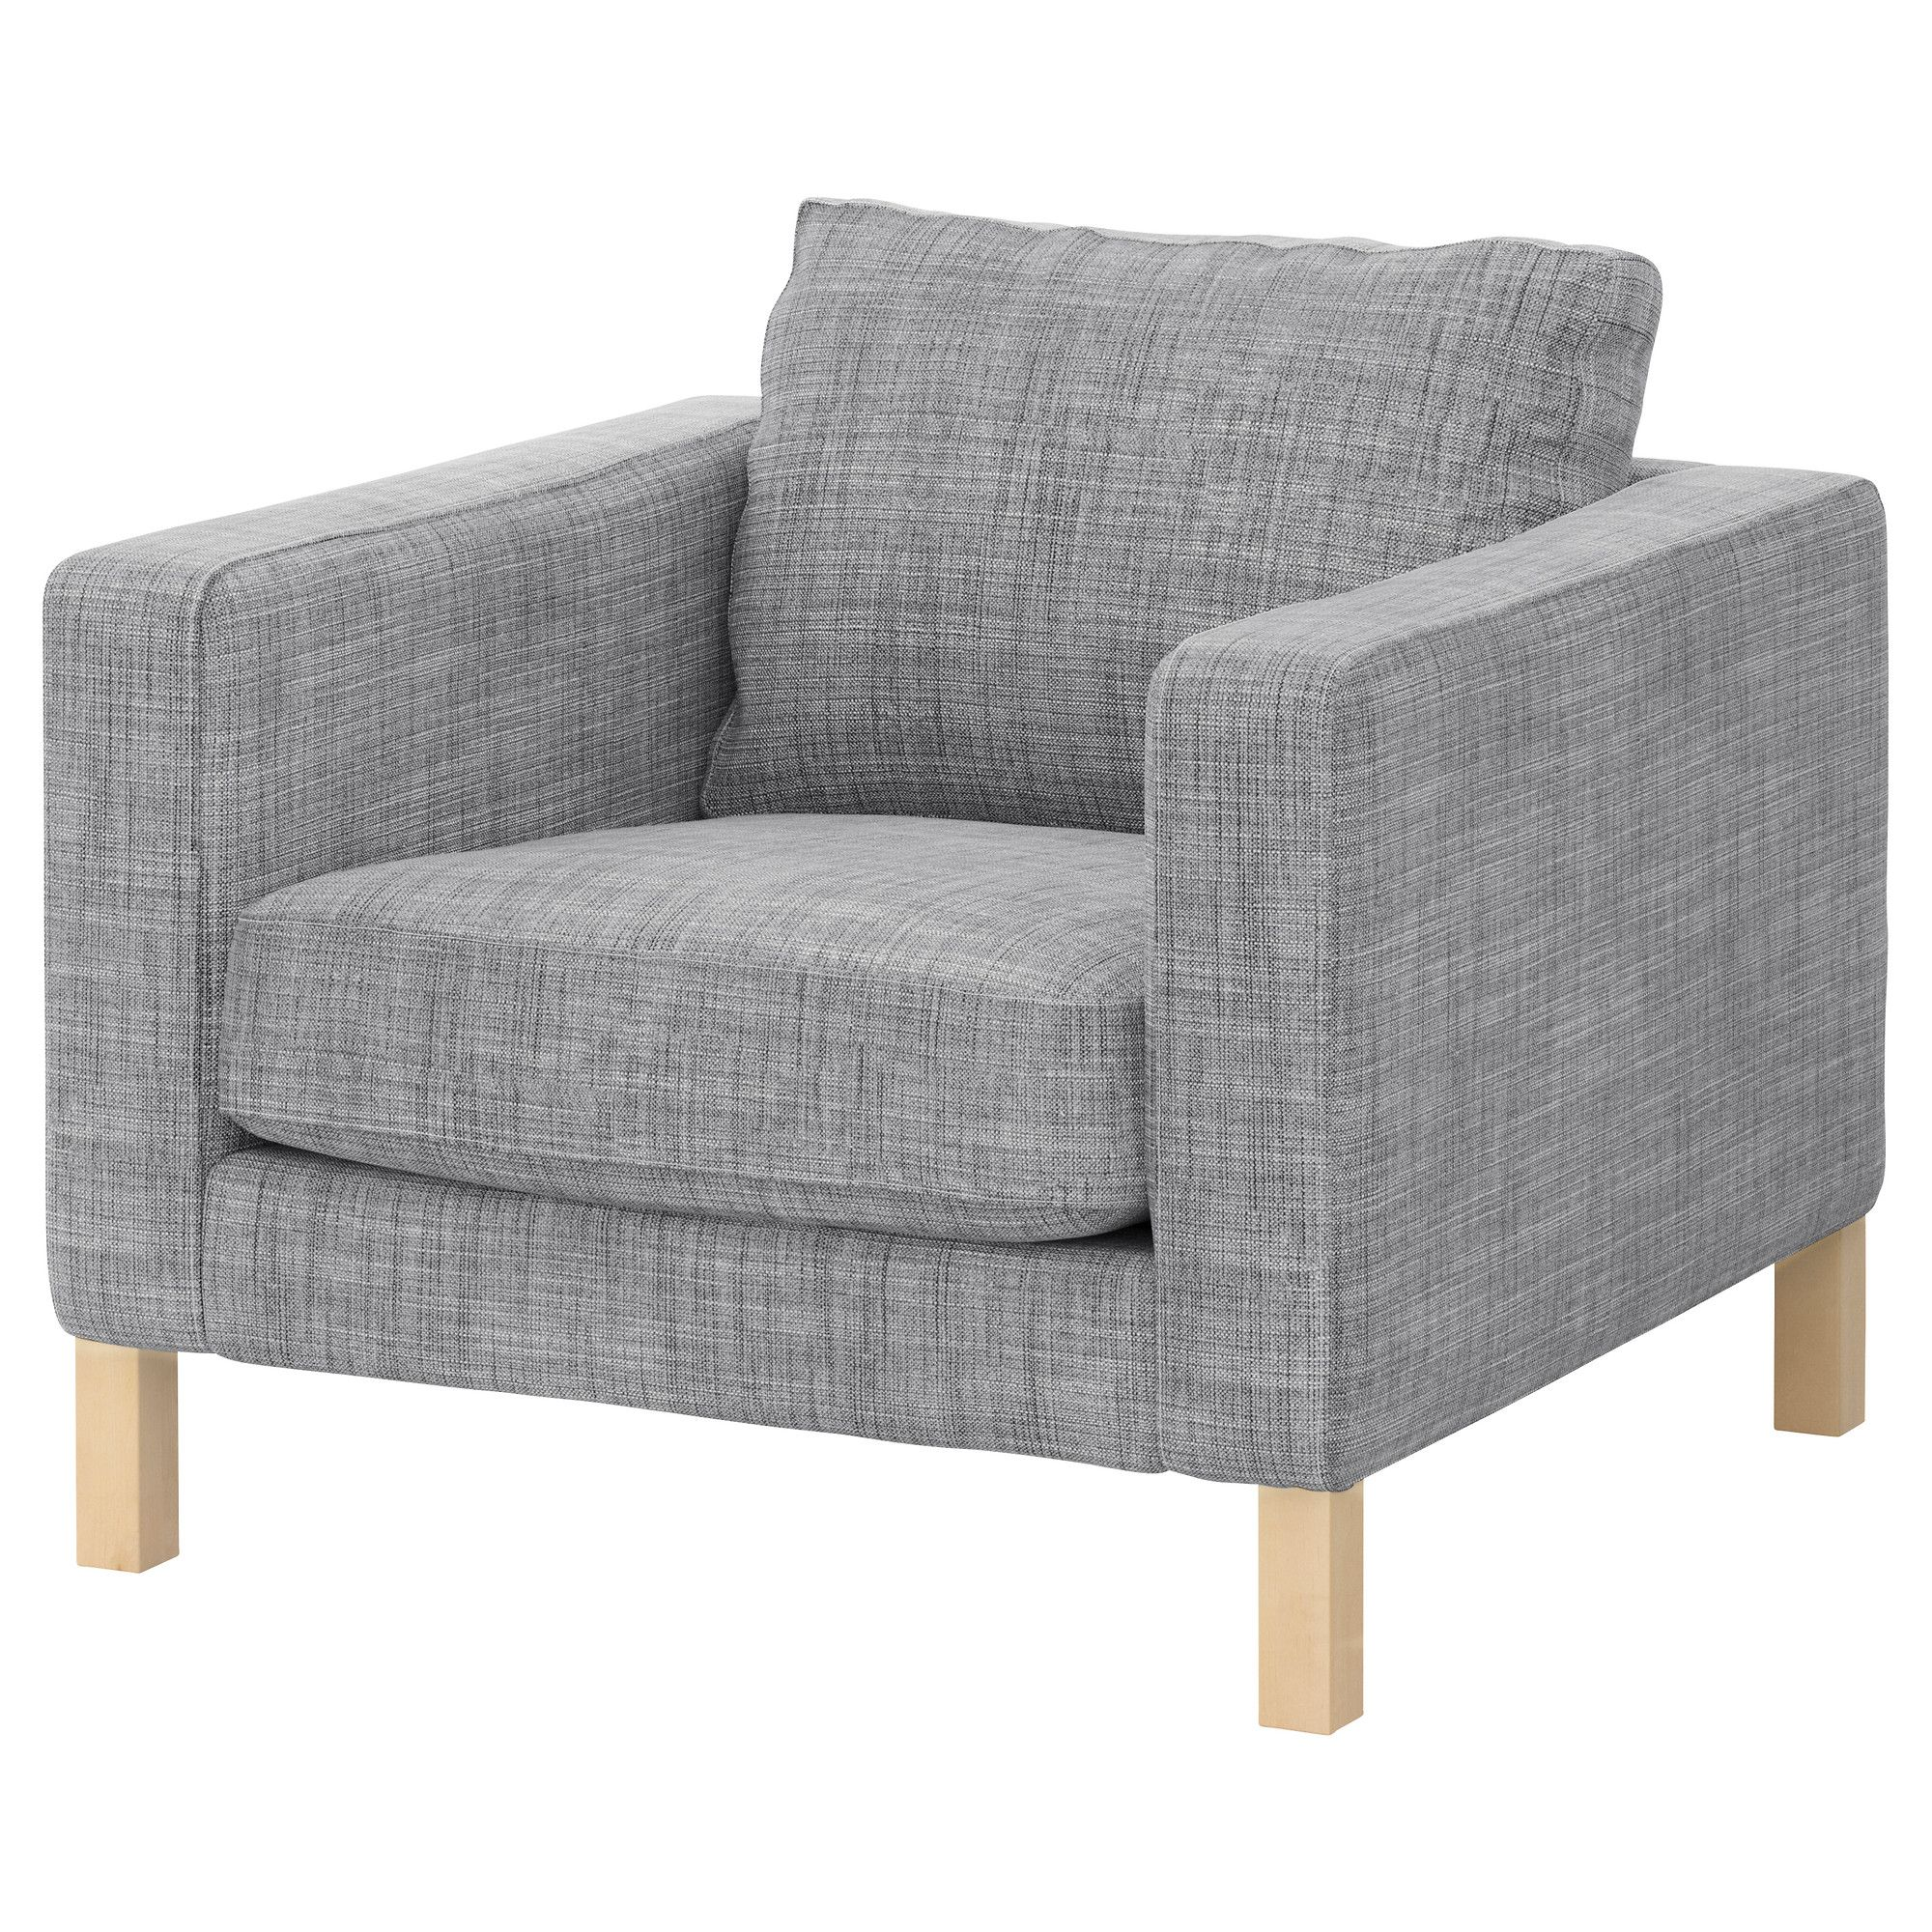 Ikea Australia Affordable Swedish Home Furniture Ikea Armchair Ikea Sofa Ikea Seat Cushions